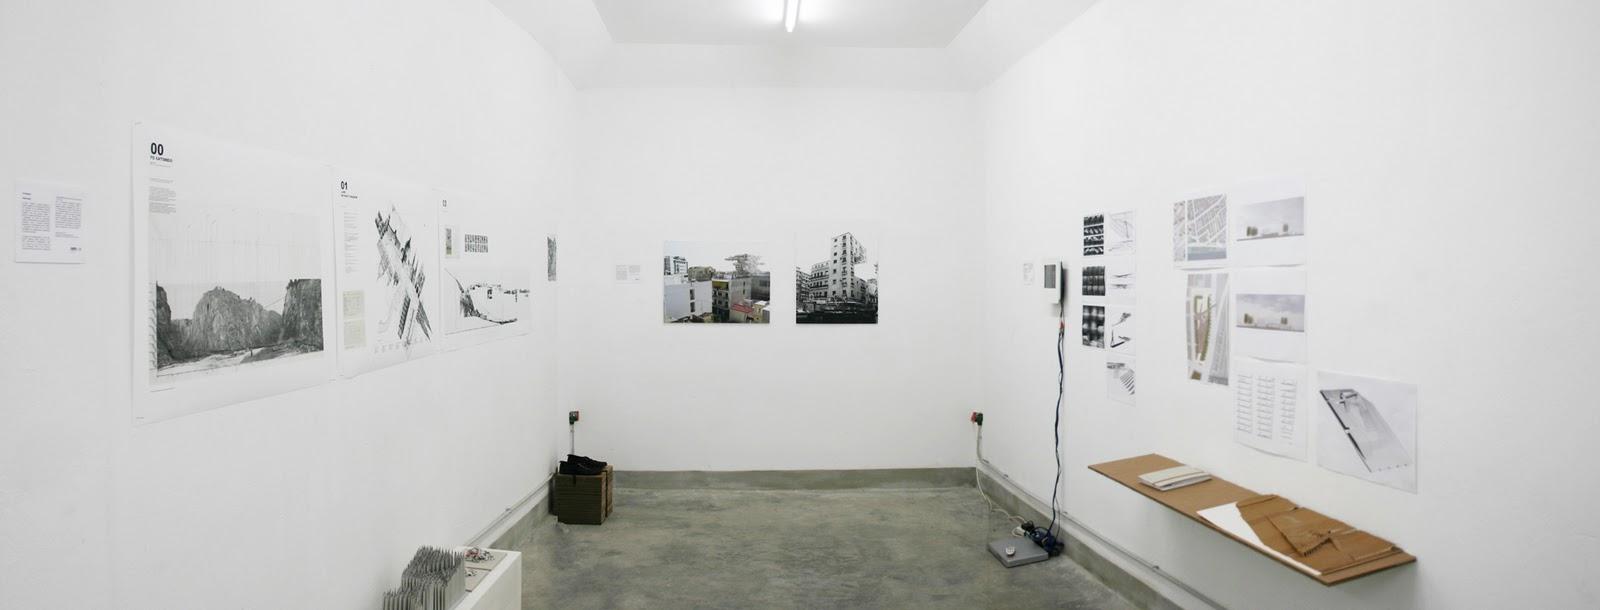 Exhibition DEMO #2 Architecture 04.jpg